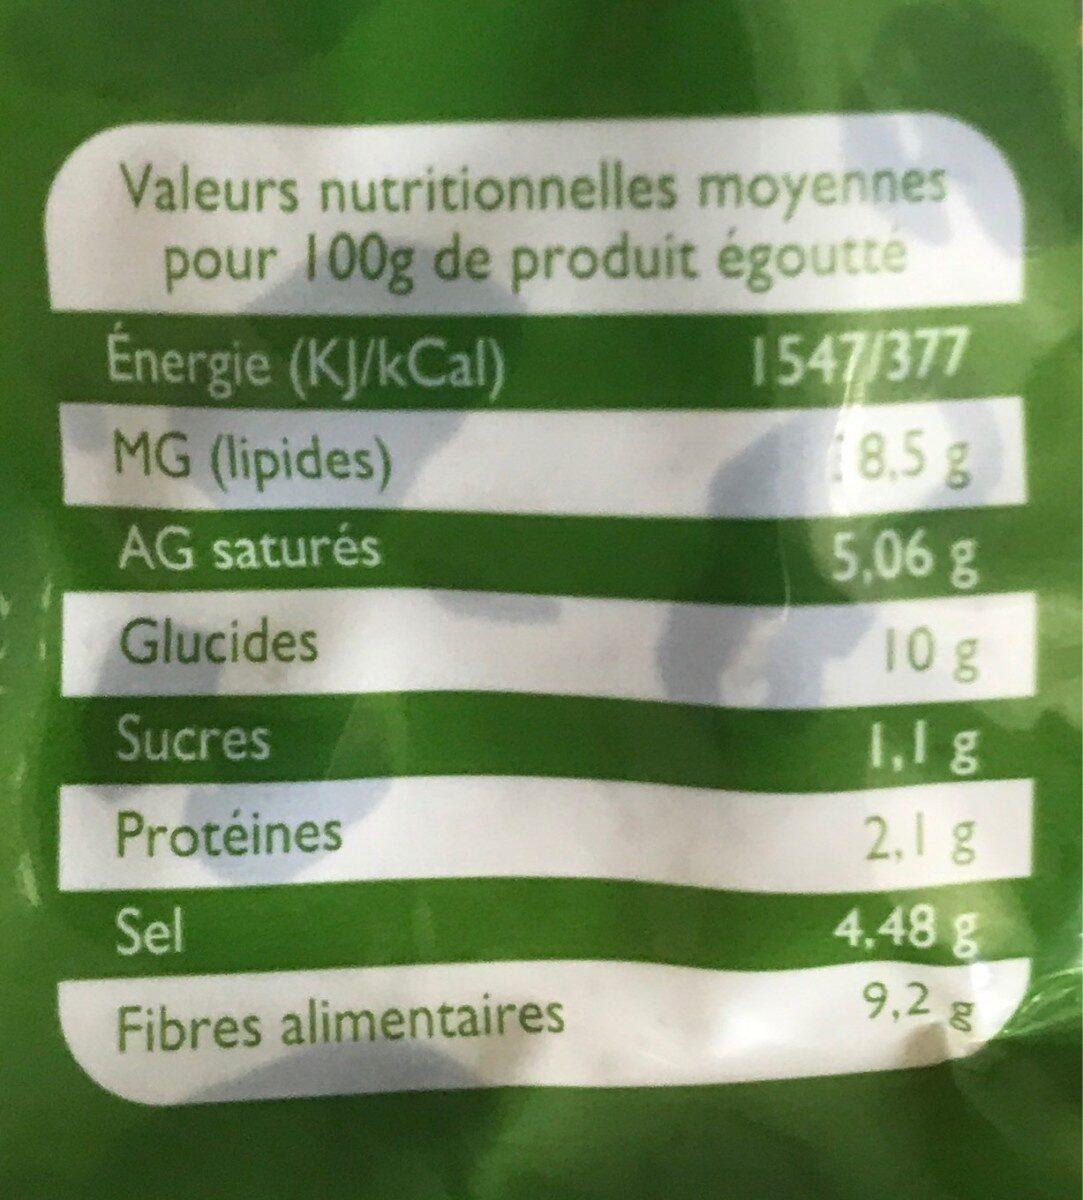 Olives noires aux aromates de Provence - Voedigswaarden